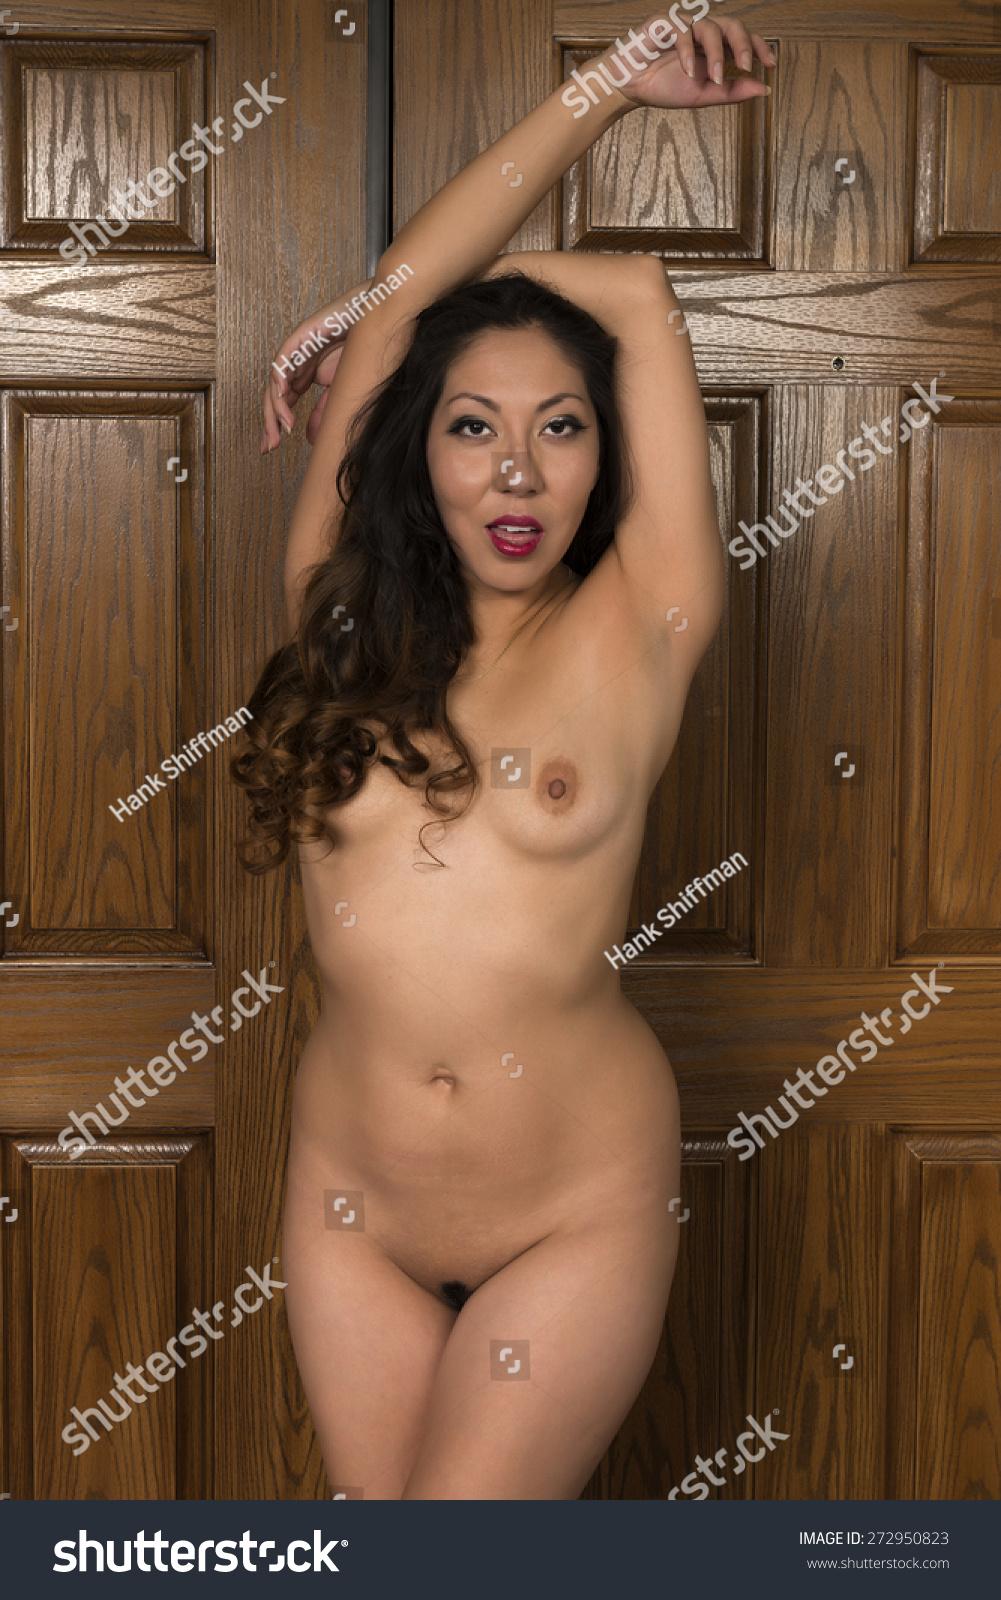 Hot naked native american women